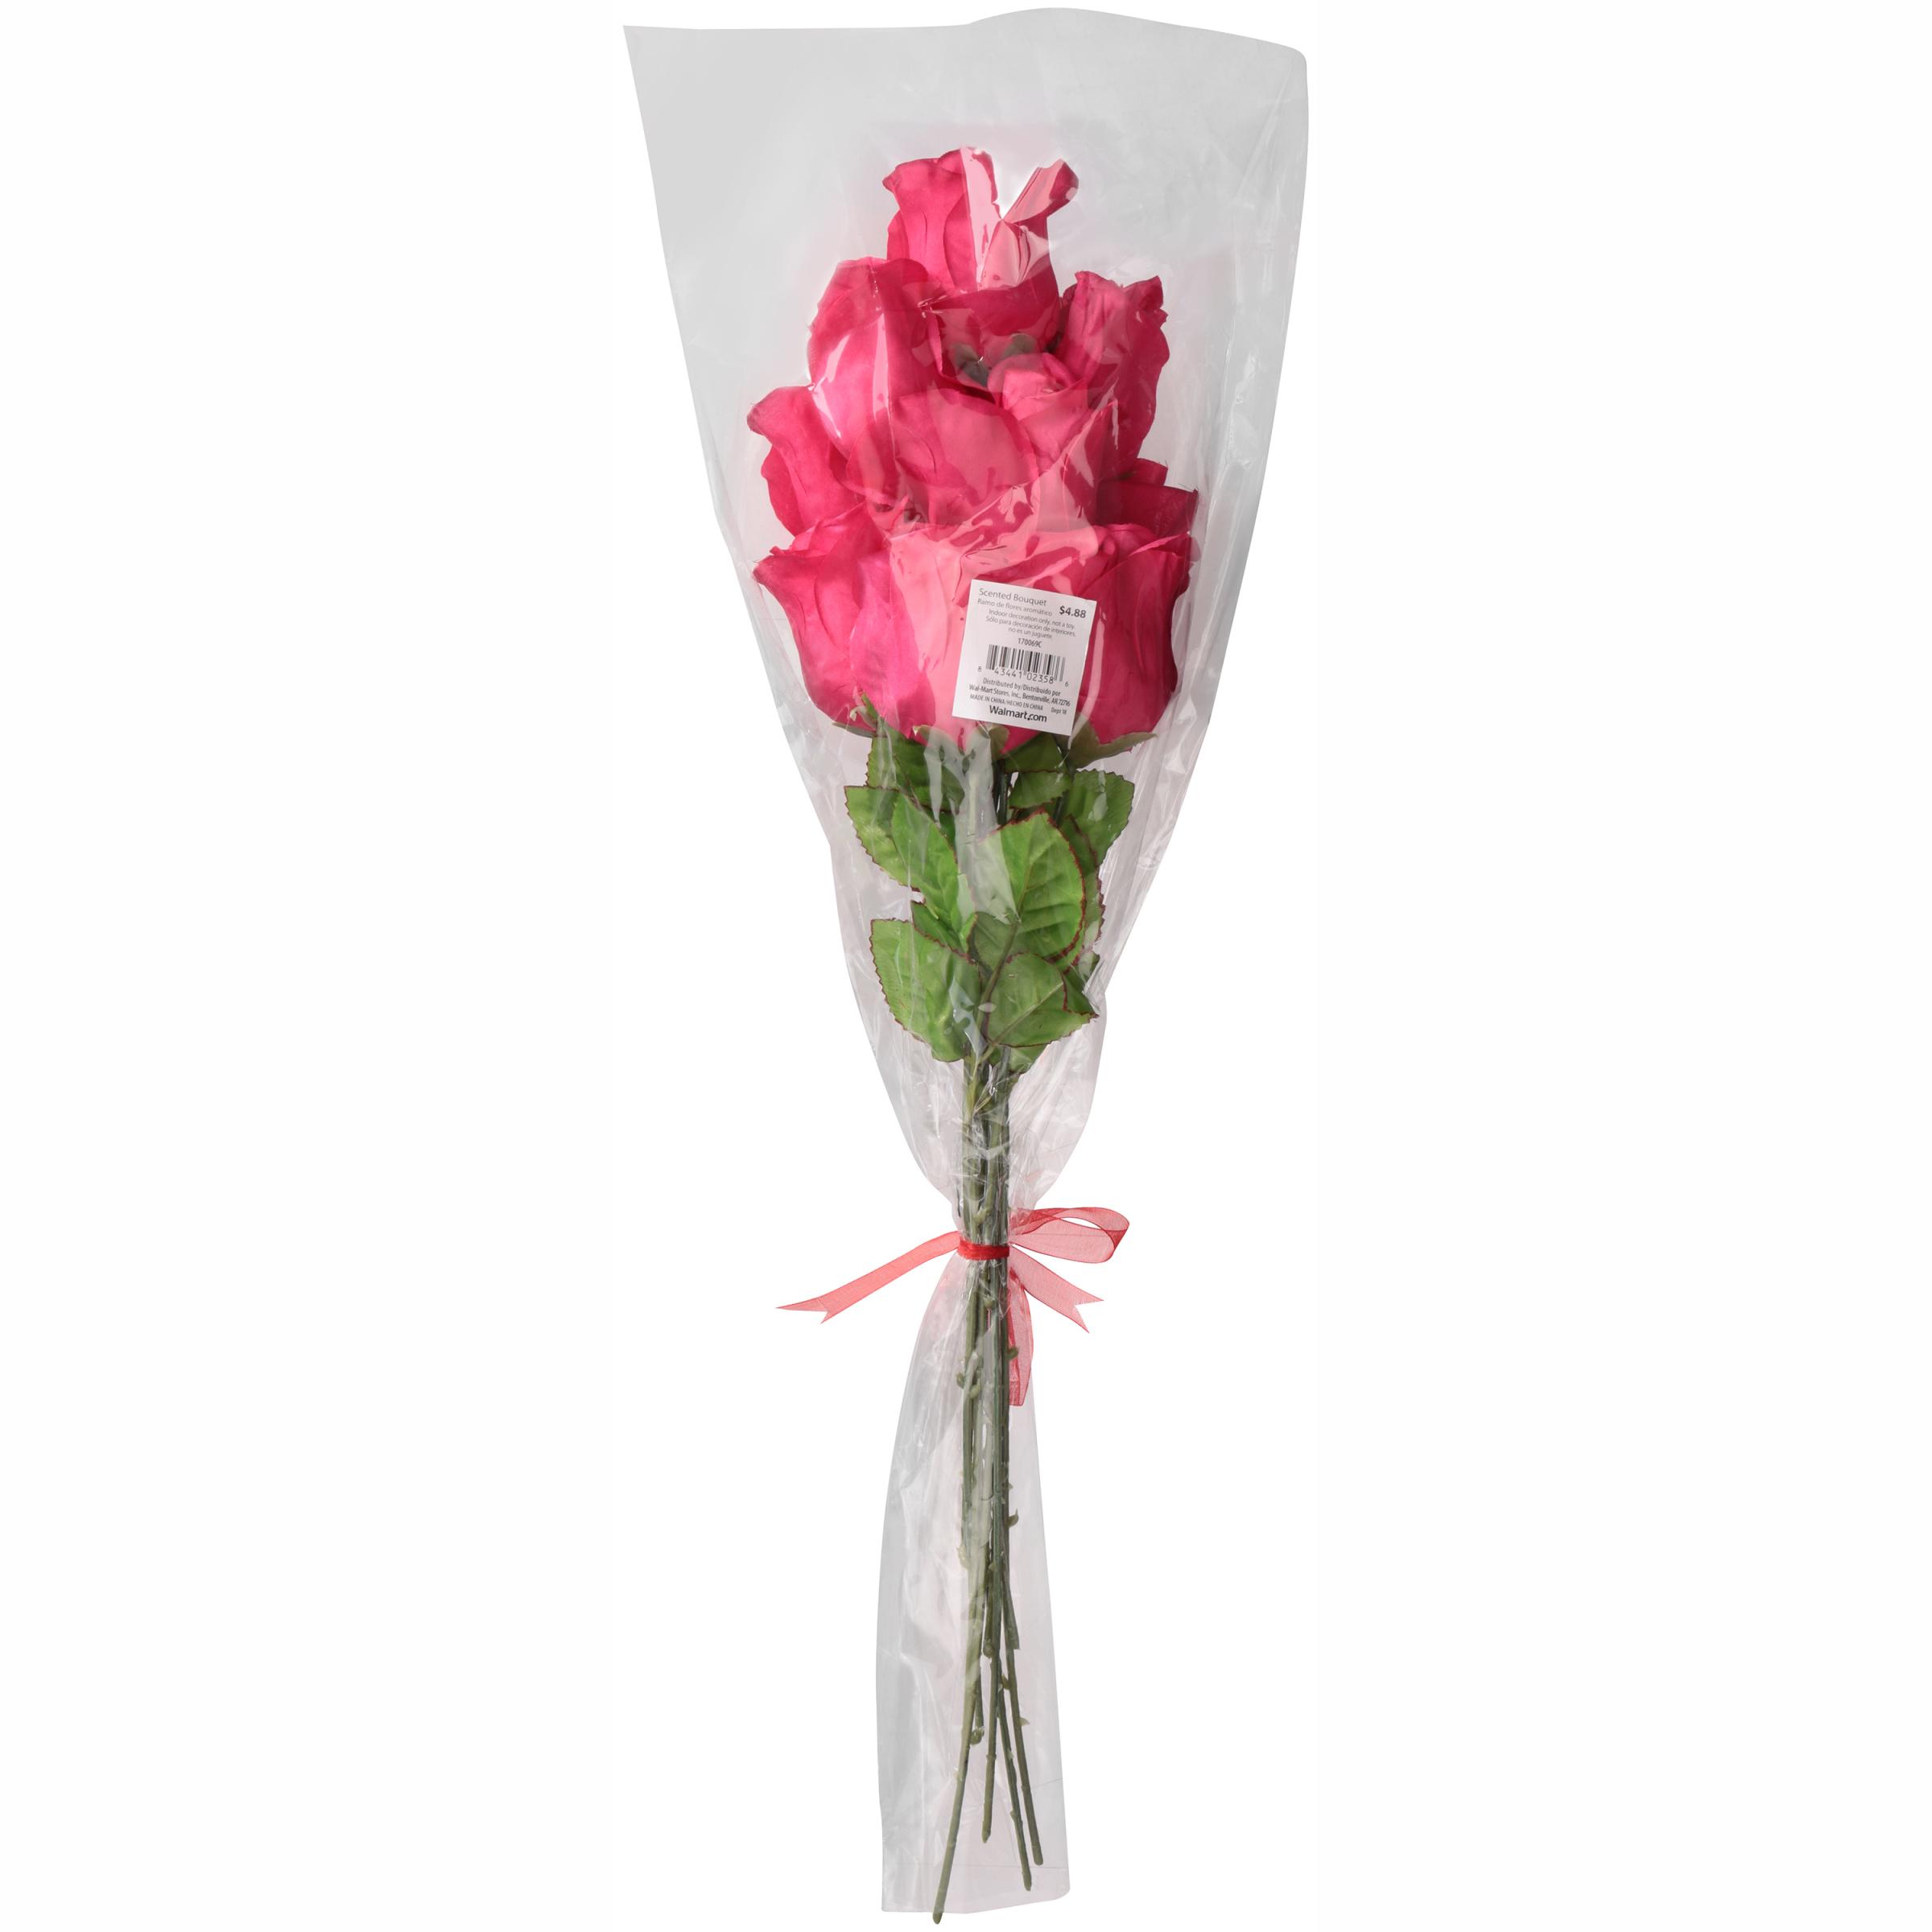 Red Rose Bouquet - Walmart.com